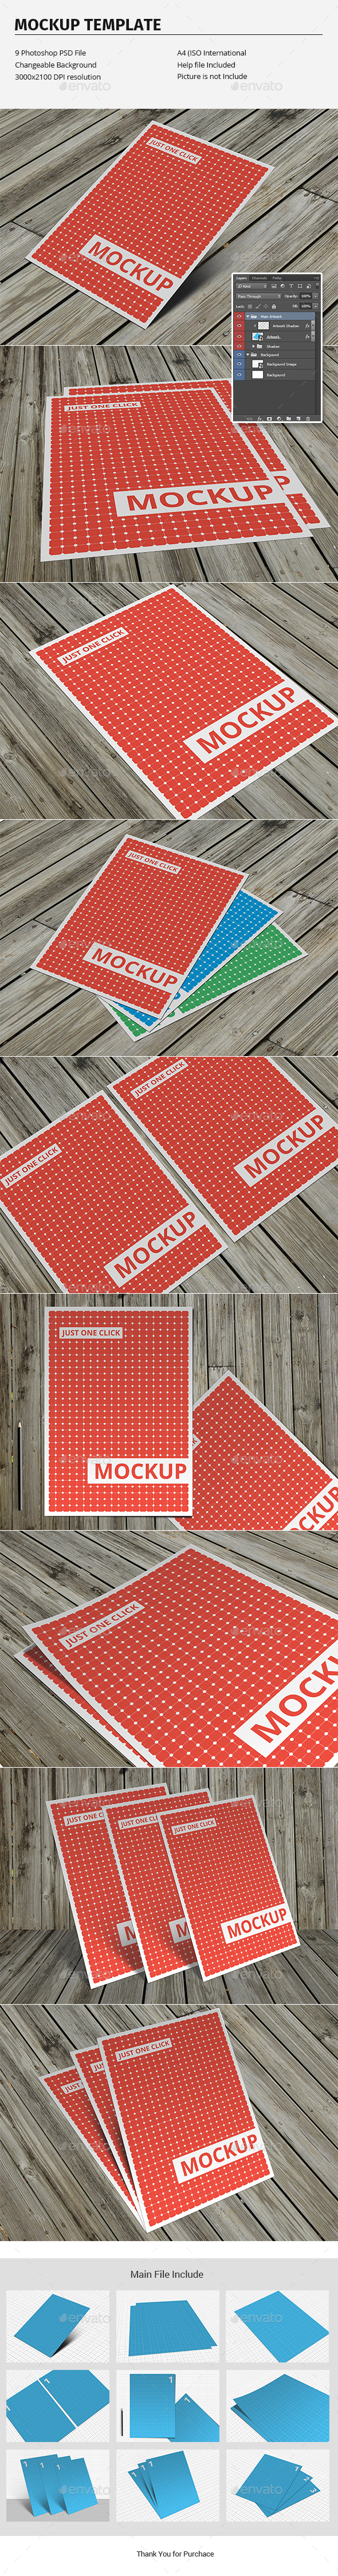 Flyer Mockup Template - Flyers Print